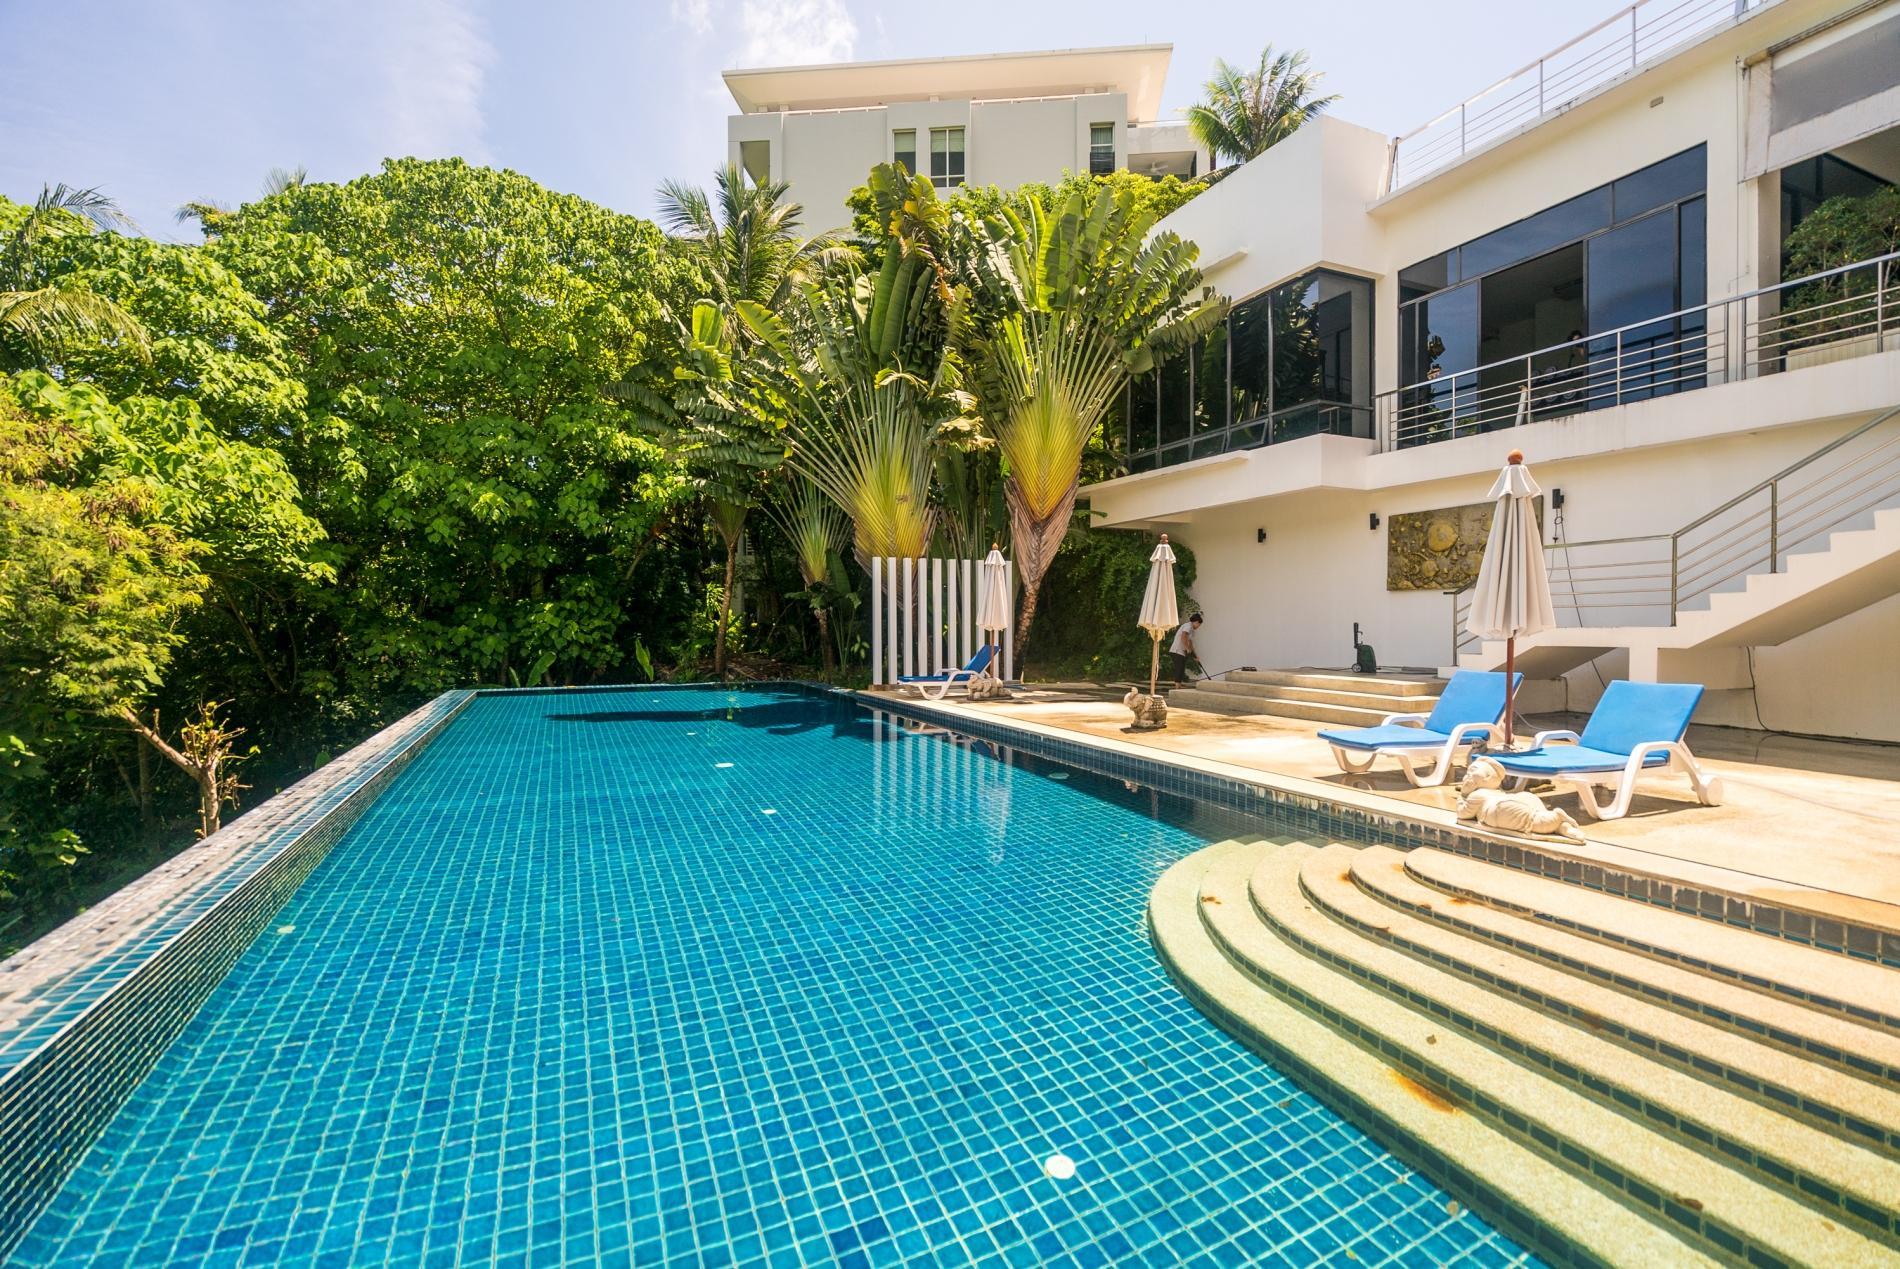 Apartment KH2605 - Sea-view Penthouse in Karon  walk to beach  restaurants  bars  shops photo 20321009